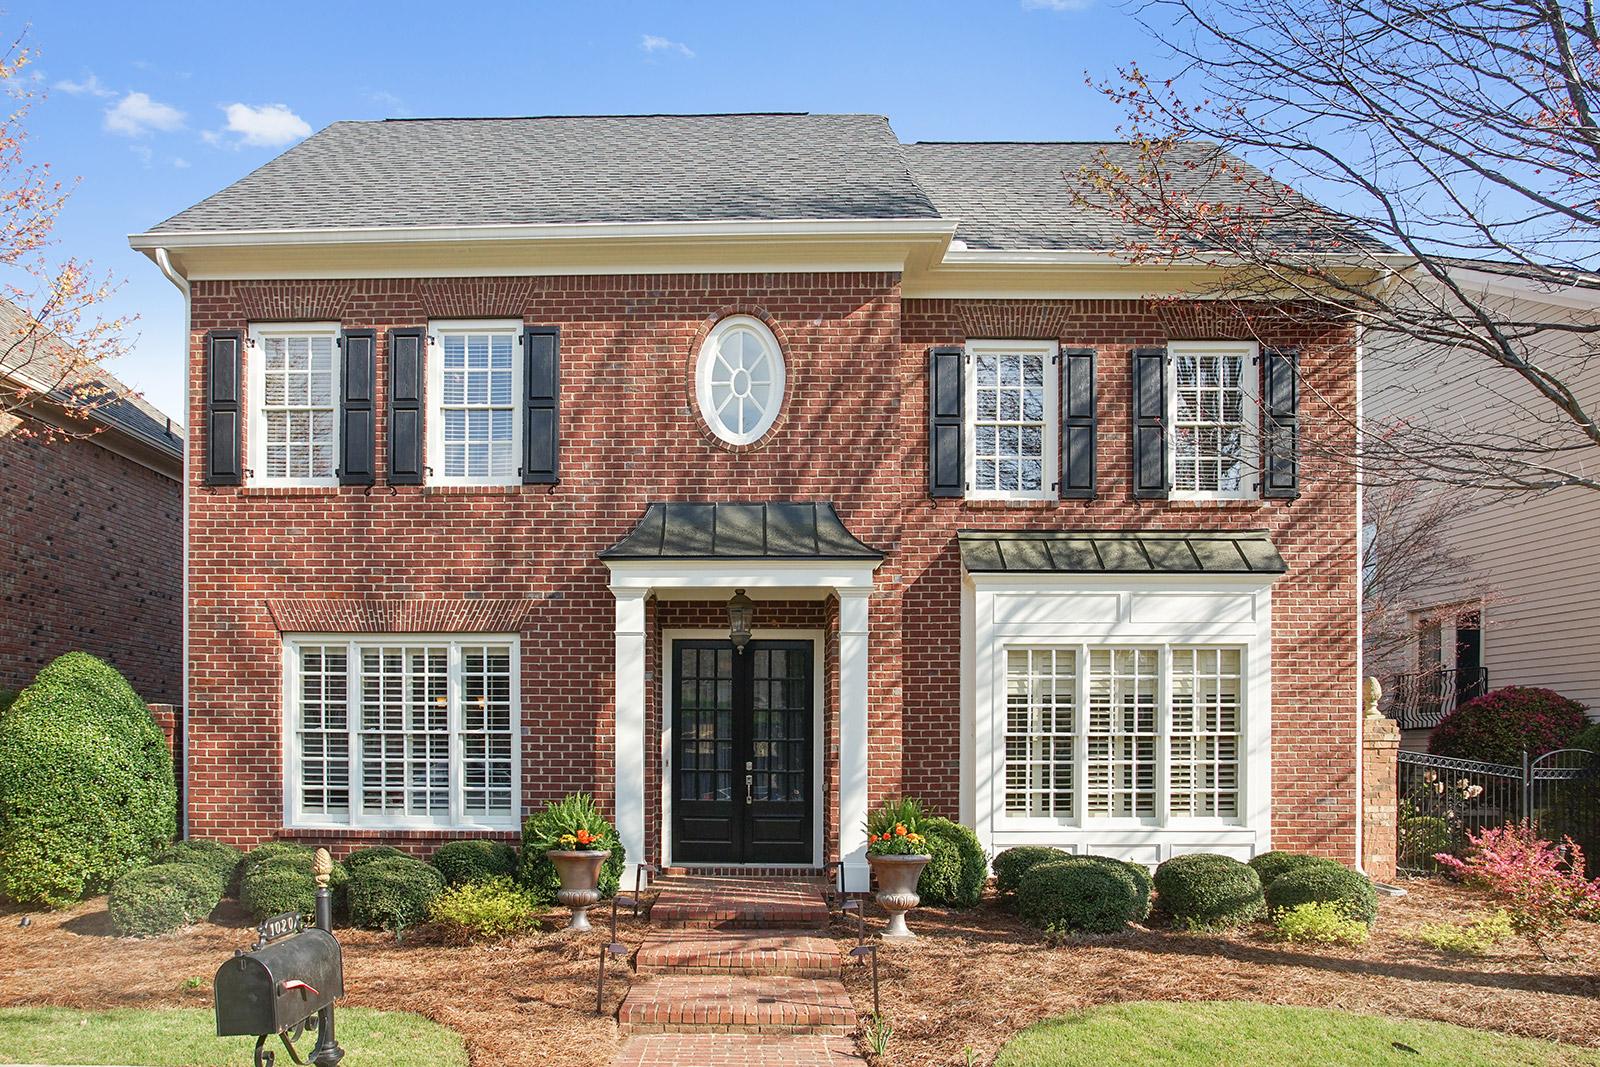 獨棟家庭住宅 為 出售 在 All Brick - Master on Main in Beautiful Palisades 1020 Ambrose Avenue Alpharetta, 喬治亞州, 30022 美國